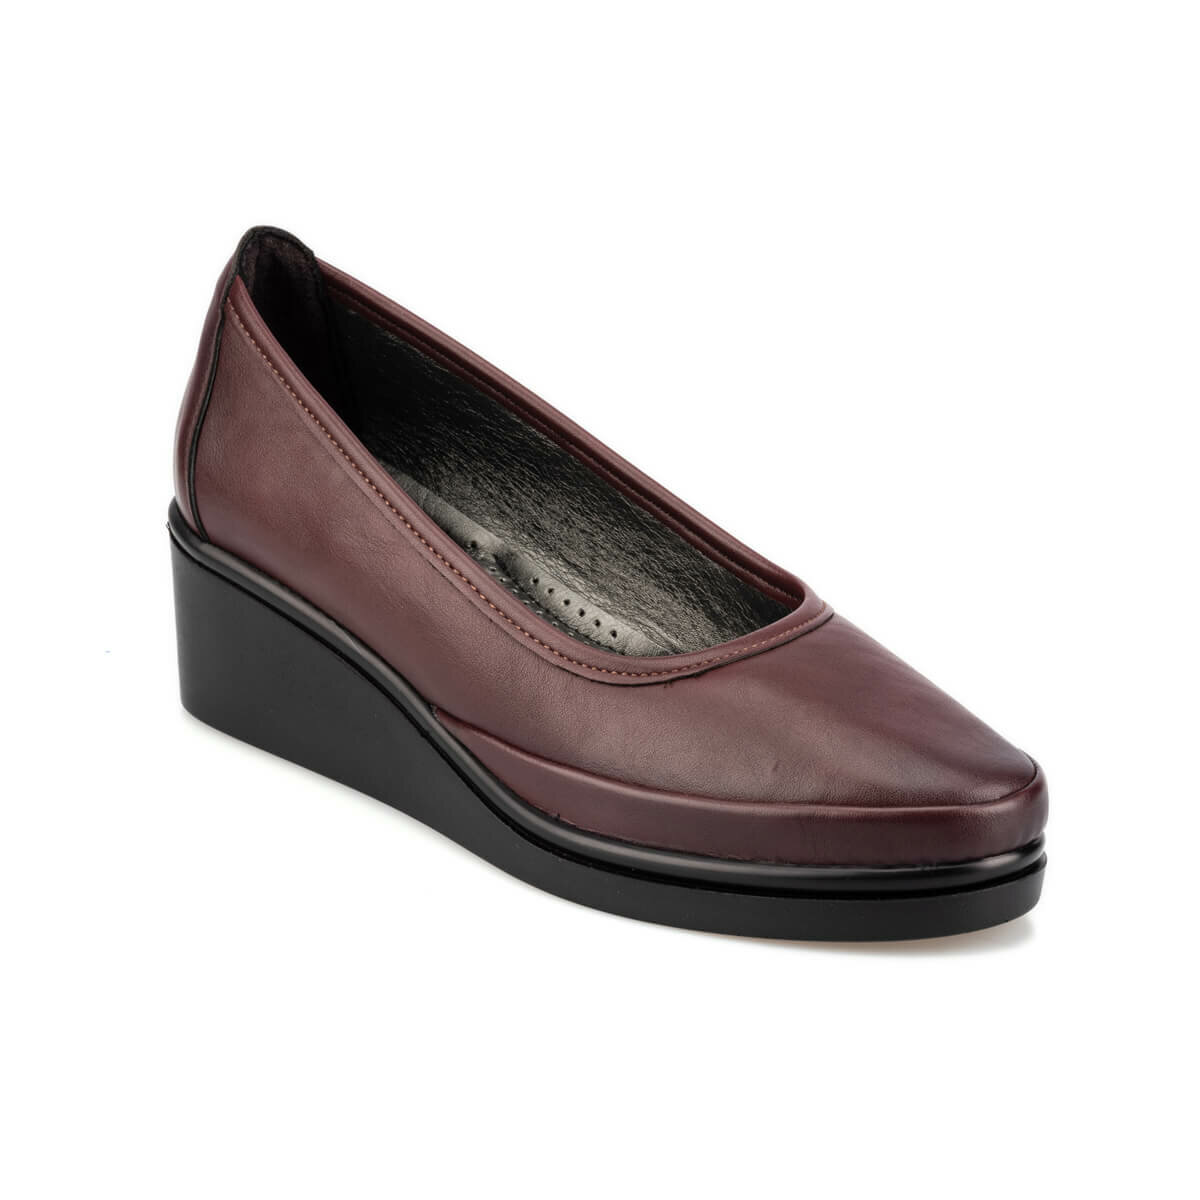 FLO 92. 151038.Z Burgundy Women 'S Wedges Shoes Polaris